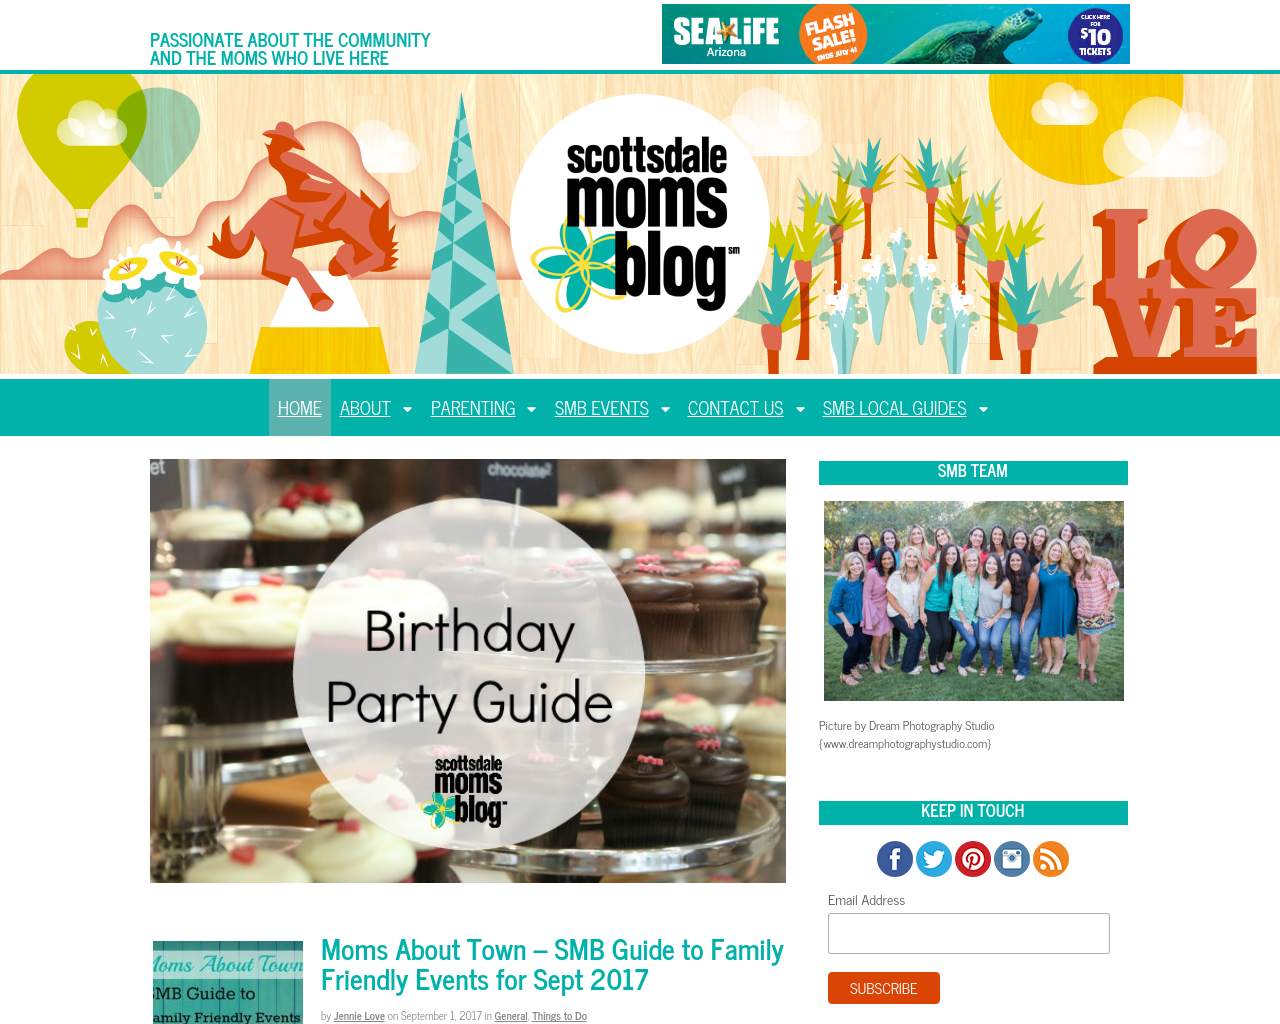 Scottsdale-Moms-Blog-Advertising-Reviews-Pricing